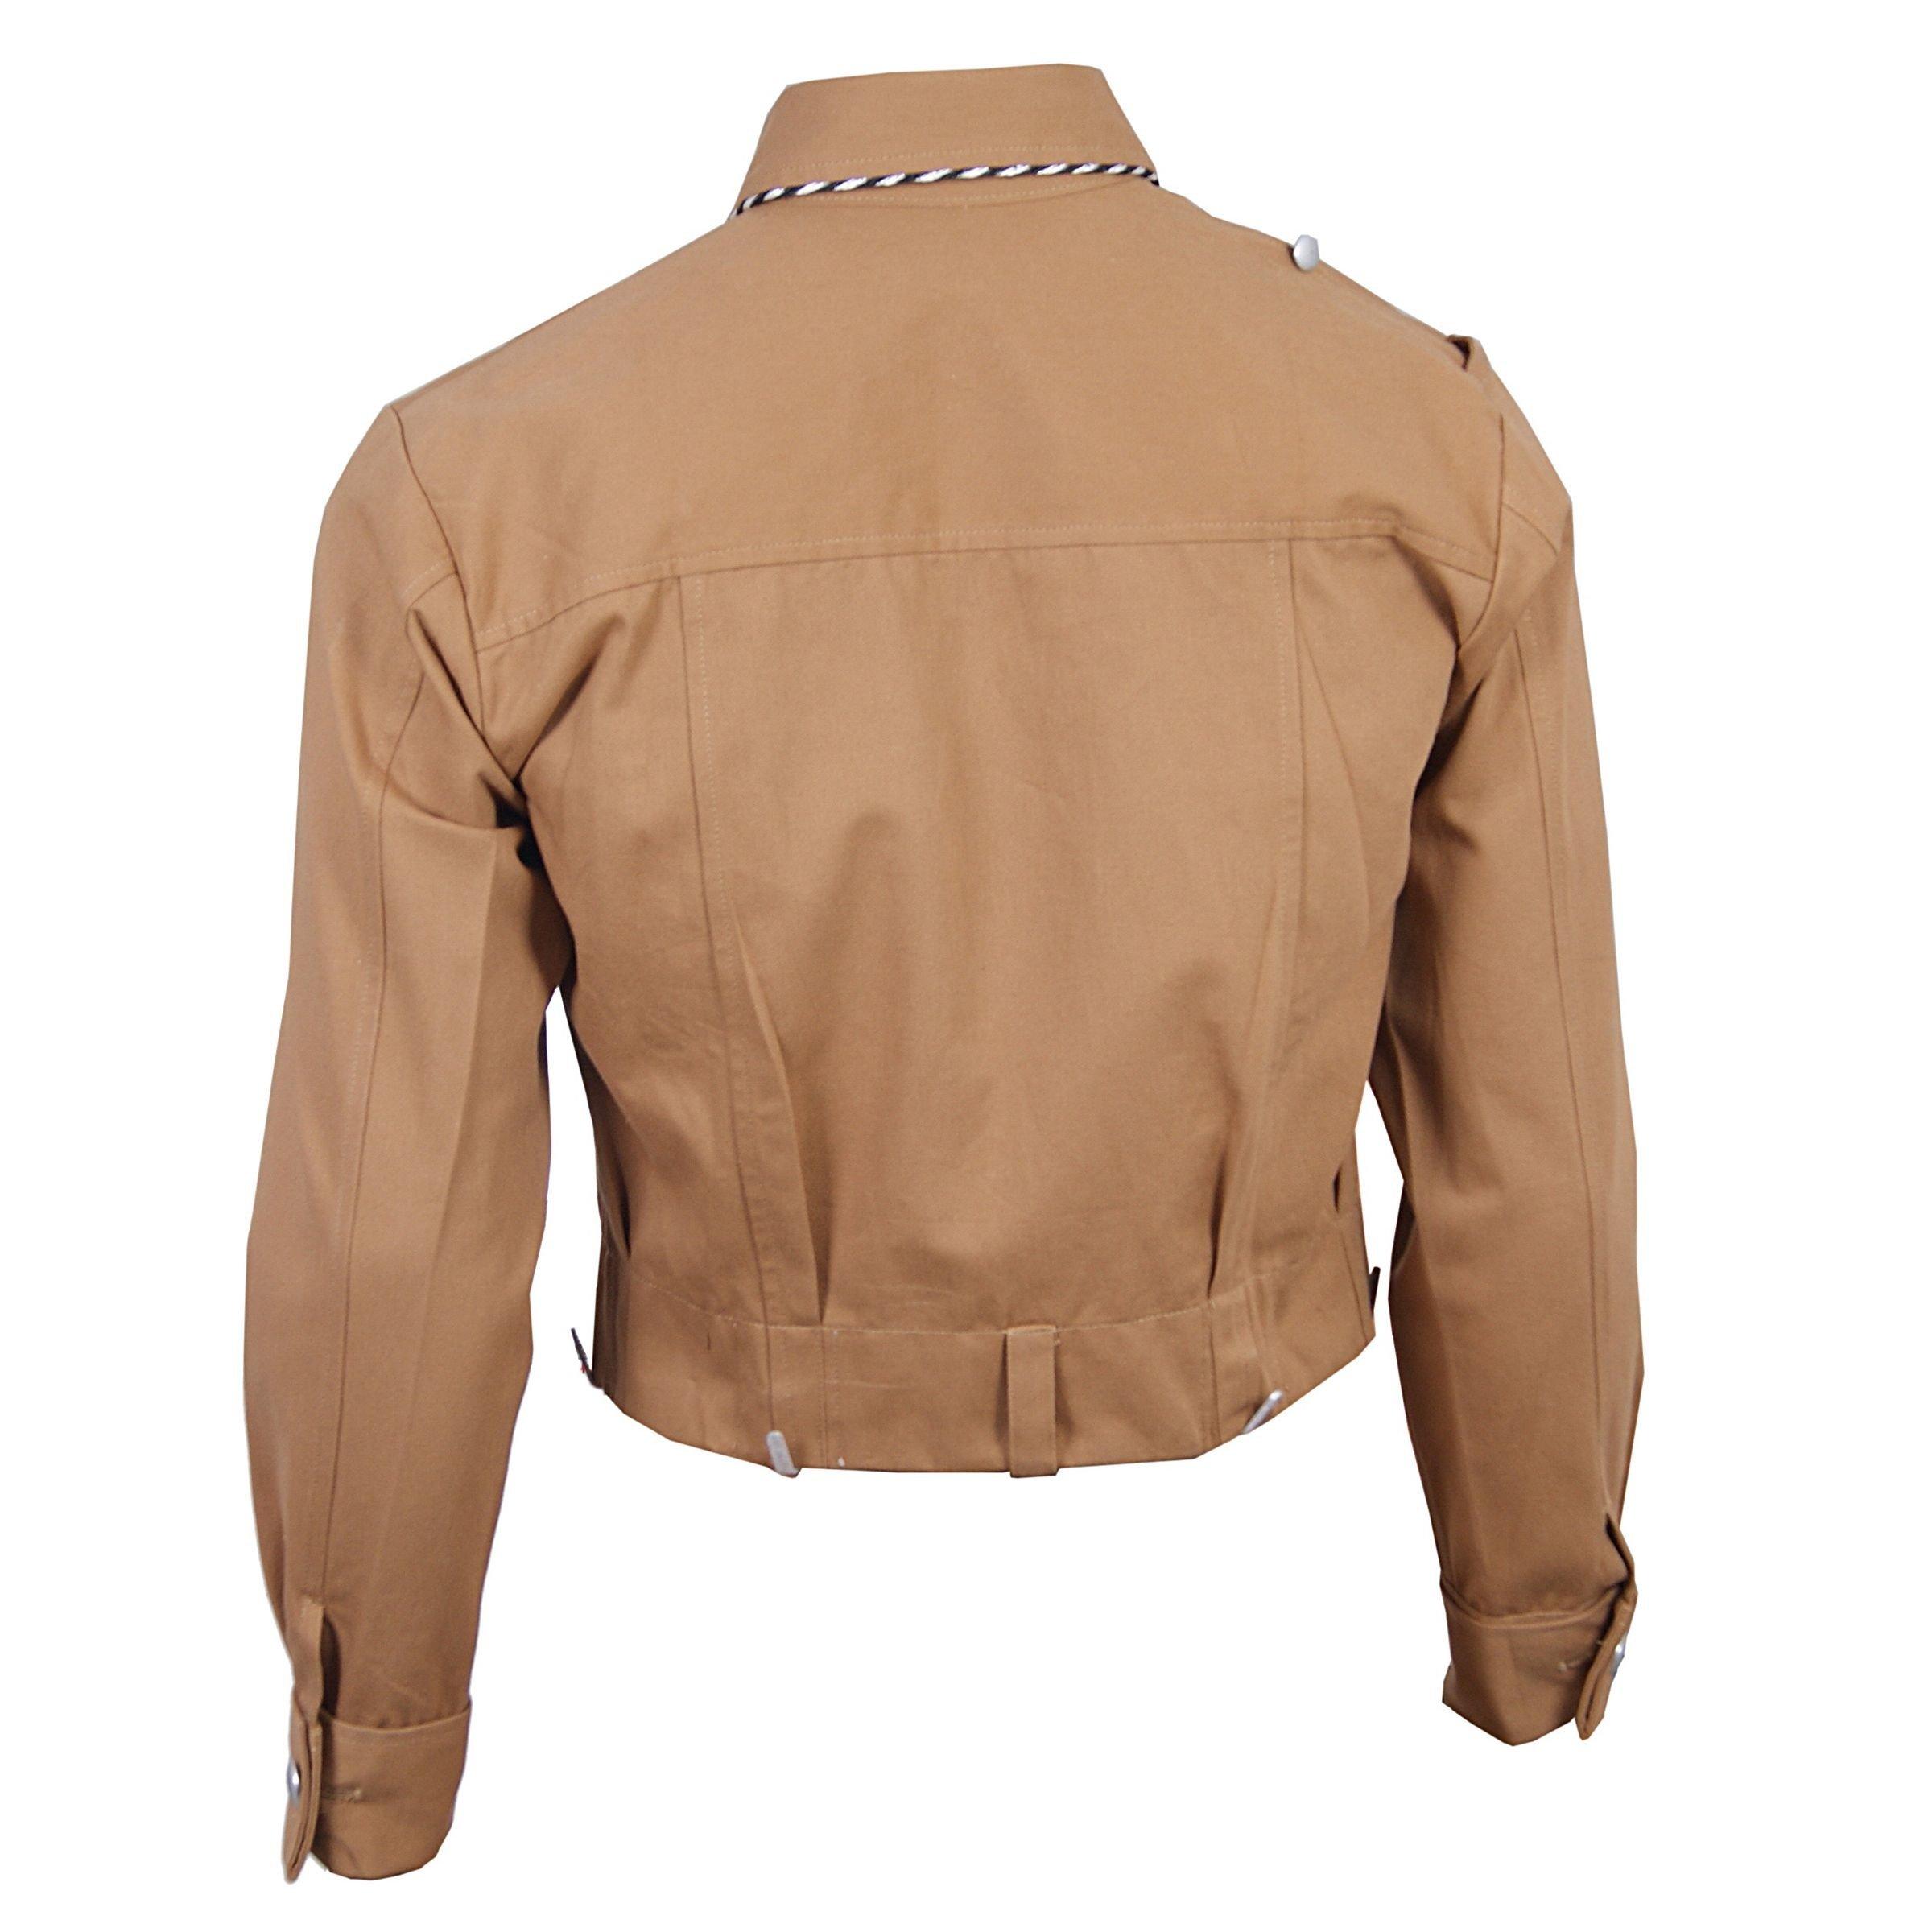 SA Hemd - Sturmabteilung uniform shirt - repro L   Germany  1933 ... 0b05c46292